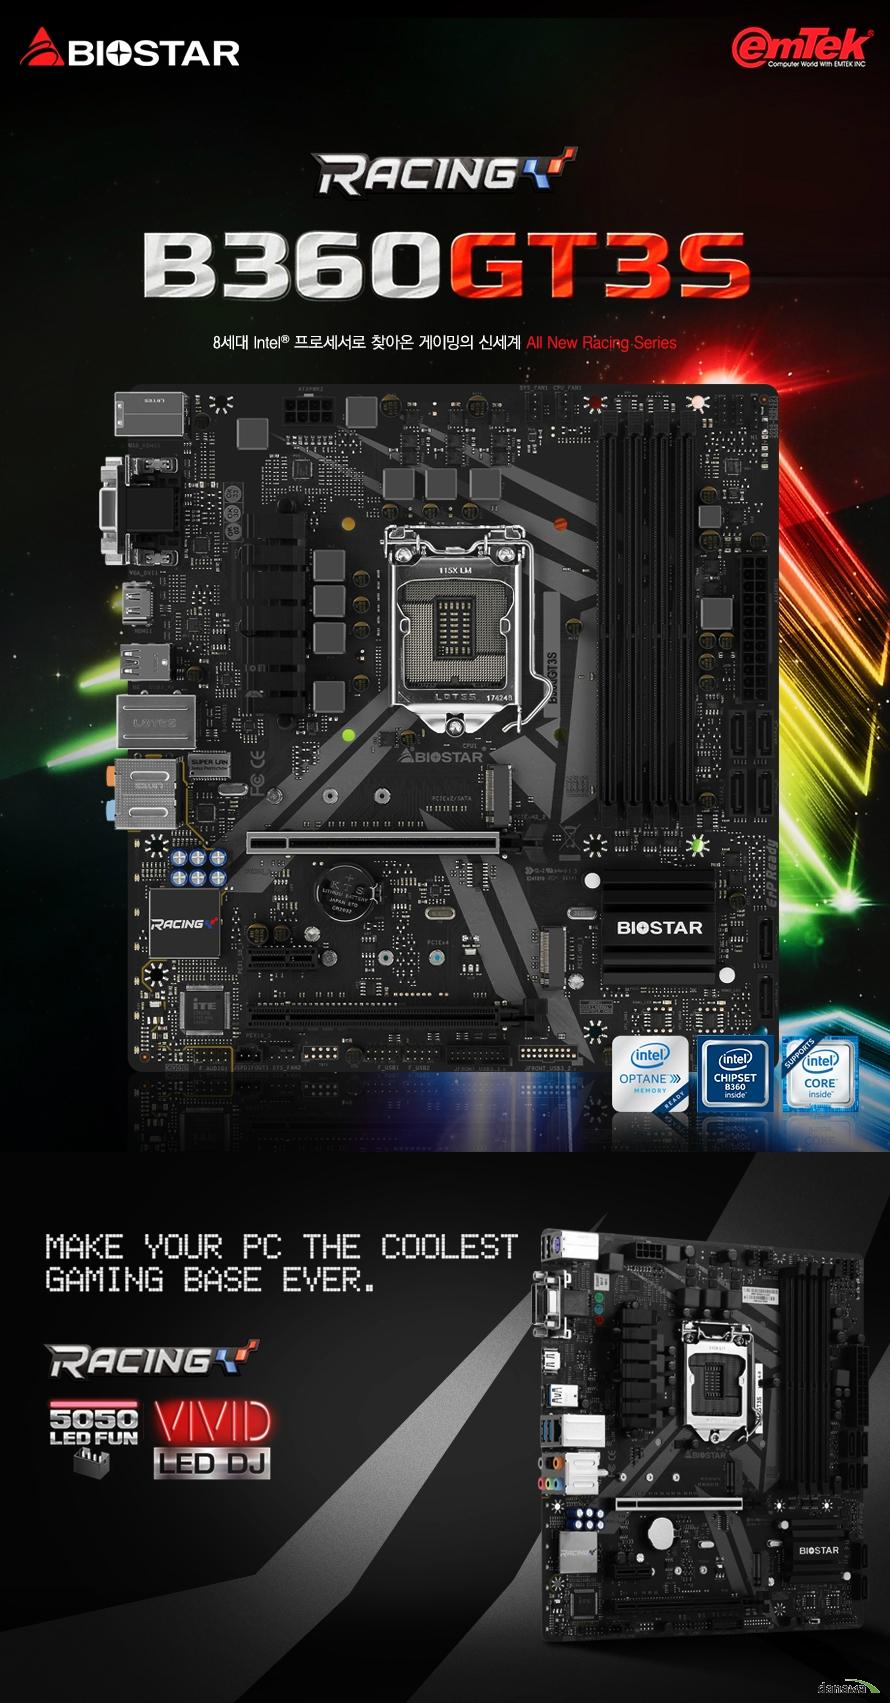 BIOSTAR B360 GT3S Cpu 8세대 인텔 코어 i7 i5 i3 및 펜티엄, 셀러론 프로세서 지원 1151소켓 지원 인텔 B360 칩셋 지원 Ddr4 dimm 최대 64gb 지원 듀얼 채널 ddr4 2666 2400 2133 1866 mhz 지원 각 dimm슬롯은 non ecc 4/8/16gb ddr4 모듈을 지원 지원하는 메모리 속도와 메모리 모듈 목록을 바이오스타 홈페이지에서 확인하세요.  Pcie 3.0 x16 1개 지원 (16배속 동작) Pcie 3.0 x16 1개 지원 (4배속 동작) Pcie 3.0 x1 1개 지원  Sata3 소켓 6개 AHCI 지원 M.2 32gbps 커넥터 1개 지원 2242 2260 2280 규격 지원 및 인텔 rapid storage 테크놀러지, 옵테인 테크놀러지 지원  m.2 16gbps 소켓 1개 지원 2242 2260 2280 규격 지원 M.2_2 슬롯에 SATA 방식 SSD를 사용할 경우 SATA3_1 커넥터는 비활성화  Usb 3.1 gen2 type a 1개 지원 Usb 3.1 gen2 type c 1개 지원 Usb 3,1 gen1 4개 지원 Usb 2.0 6개 지원 인텔 i219v 기가비트 랜 지원 리얼텍 alc 1150 7.1채널hd 오디오 코덱 지원 윈도우10 64비트 지원  M-atx 폼팩터 길이 244밀리미터 넓이 230밀리미터  kc인증 r rei emt bs B360GT3S b   제조사의 사정에 따라 사전고지 없이 일부 제품사양이 변경될 수 있습니다. 구매 전 사용하시는 부품과 cpu 프로세서 등 장착 지원 여부를 확인하시기 바랍니다.